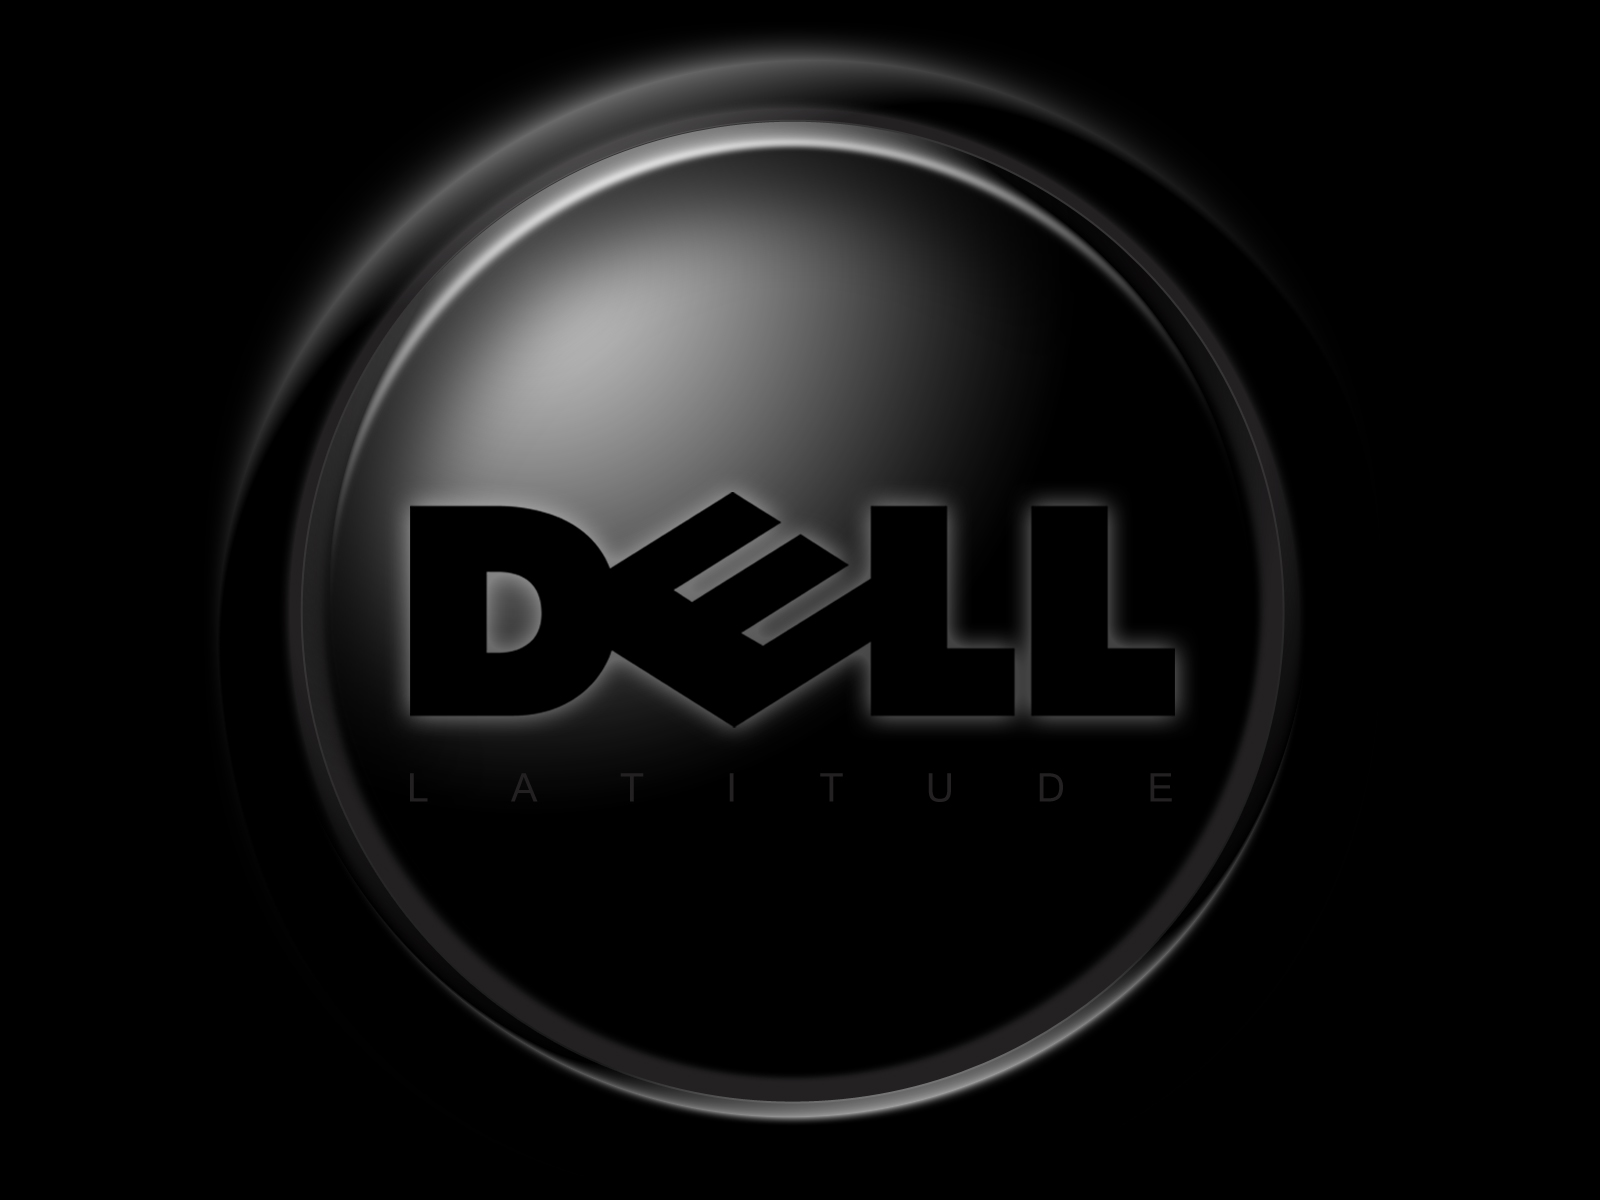 Dell Wallpaper - Wallpapers